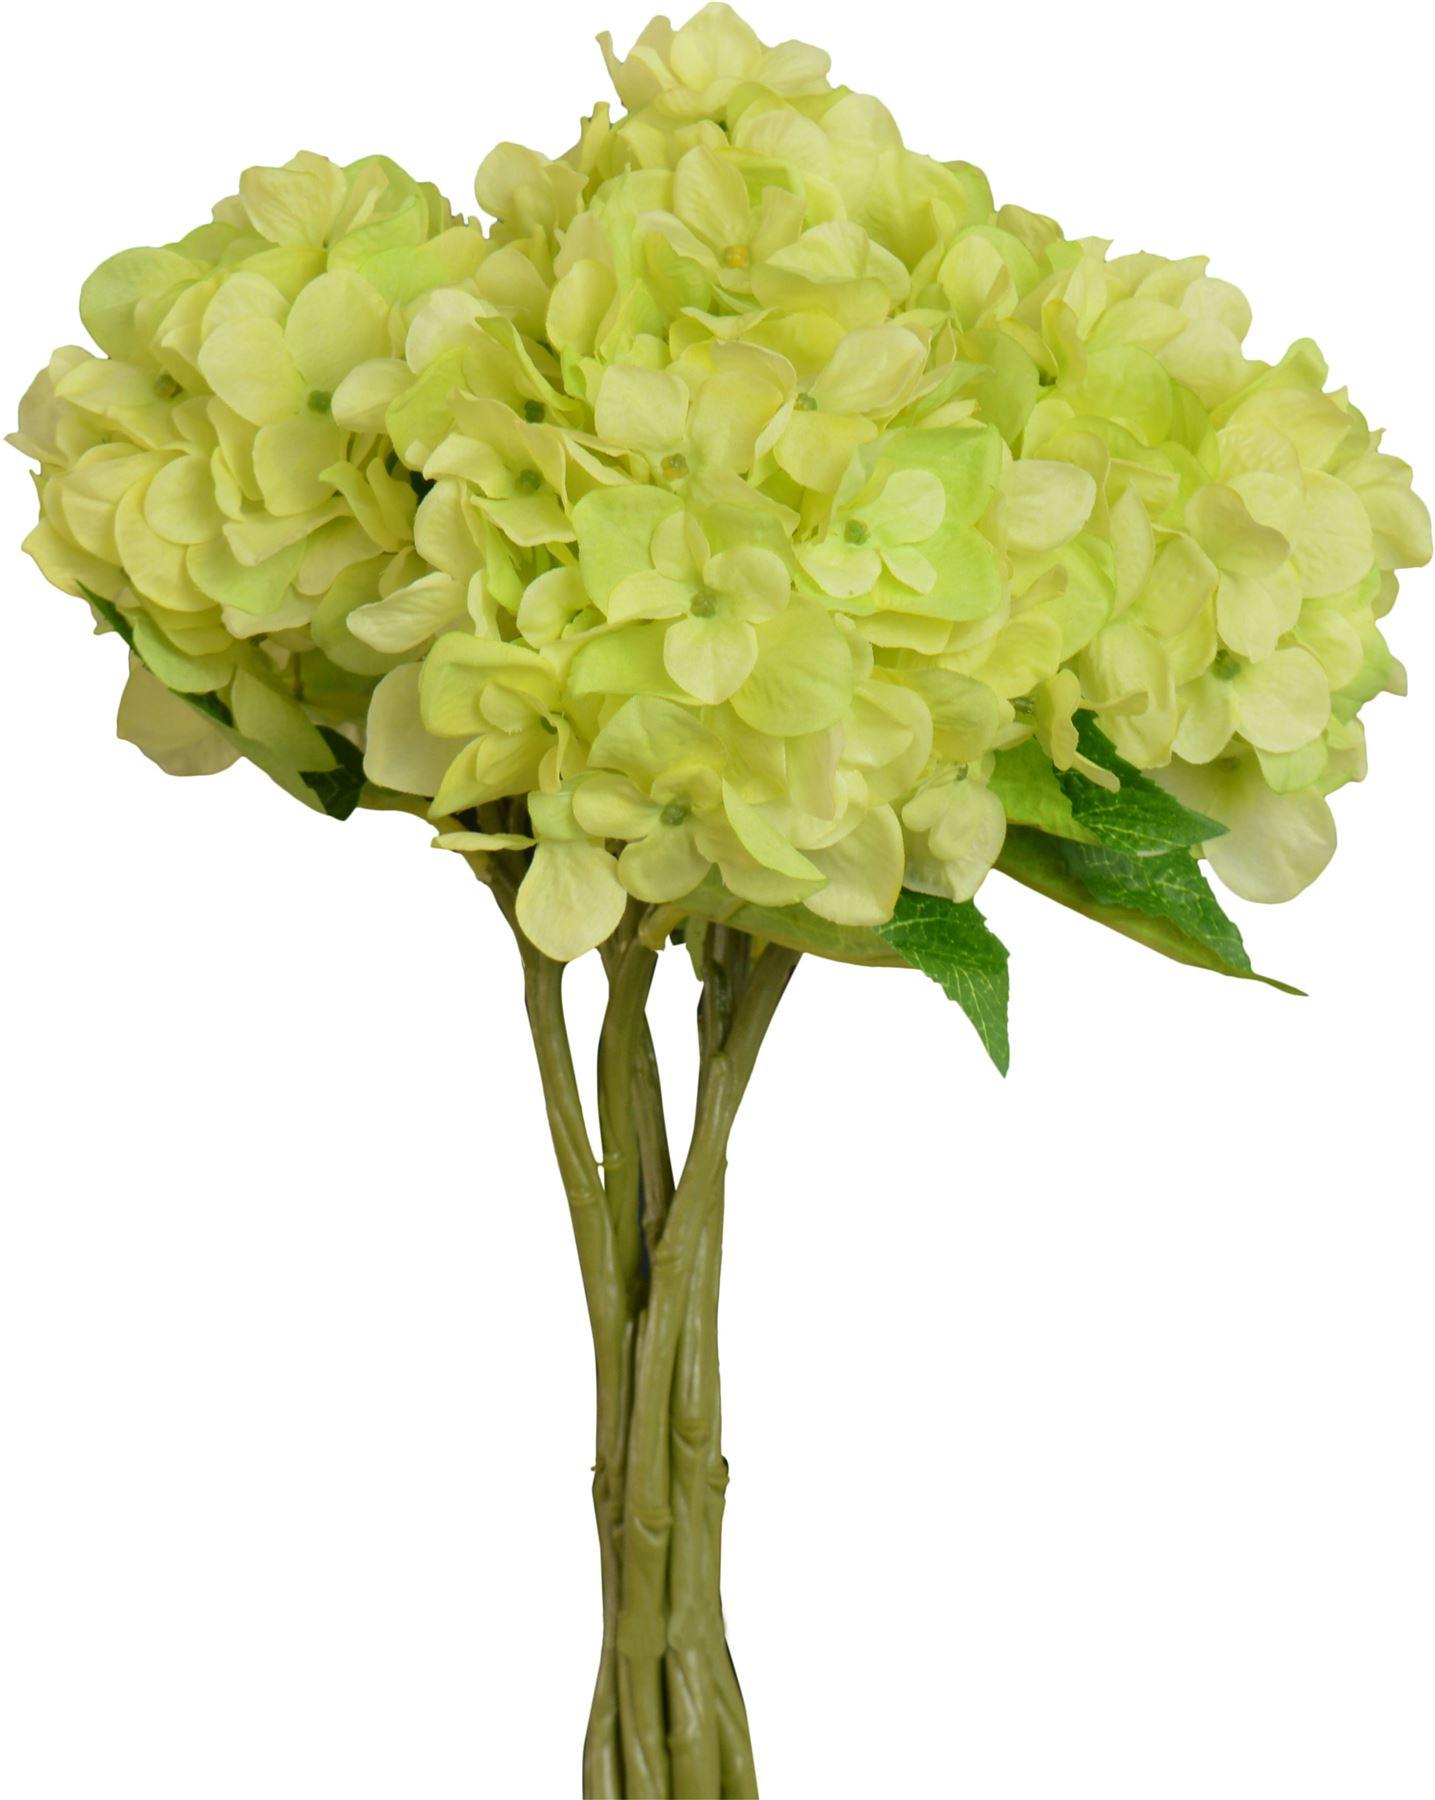 Artificial short stem hydrangea flower plants in green 37cm artificial short stem hydrangea flower plants in green 37cm bunch of 6 stems mightylinksfo